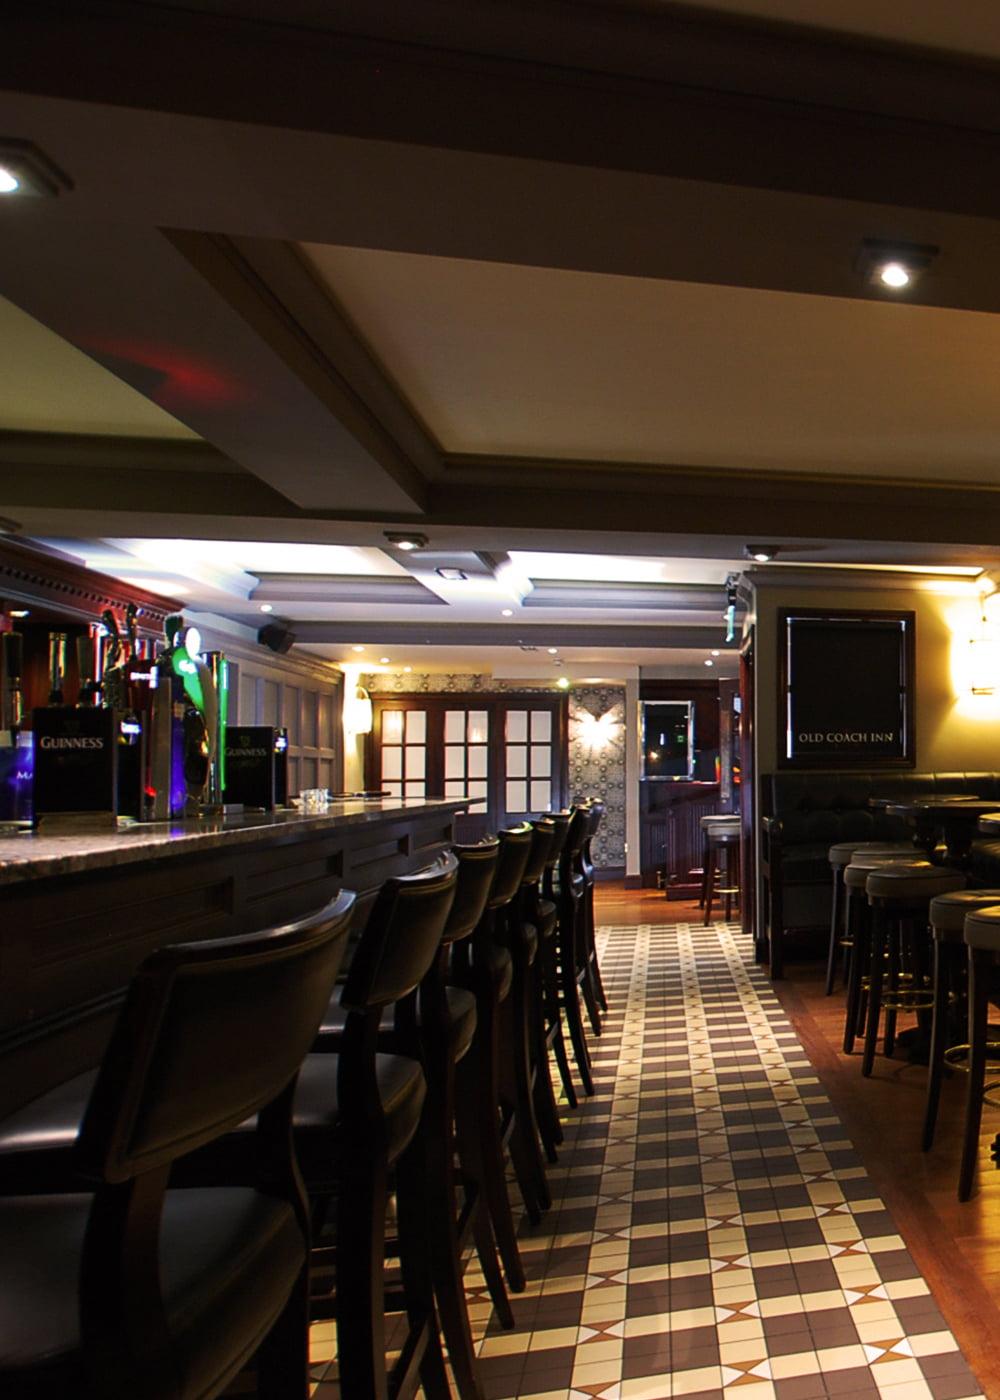 Meegan builders - old coach inn restaurant and barcastleblayney